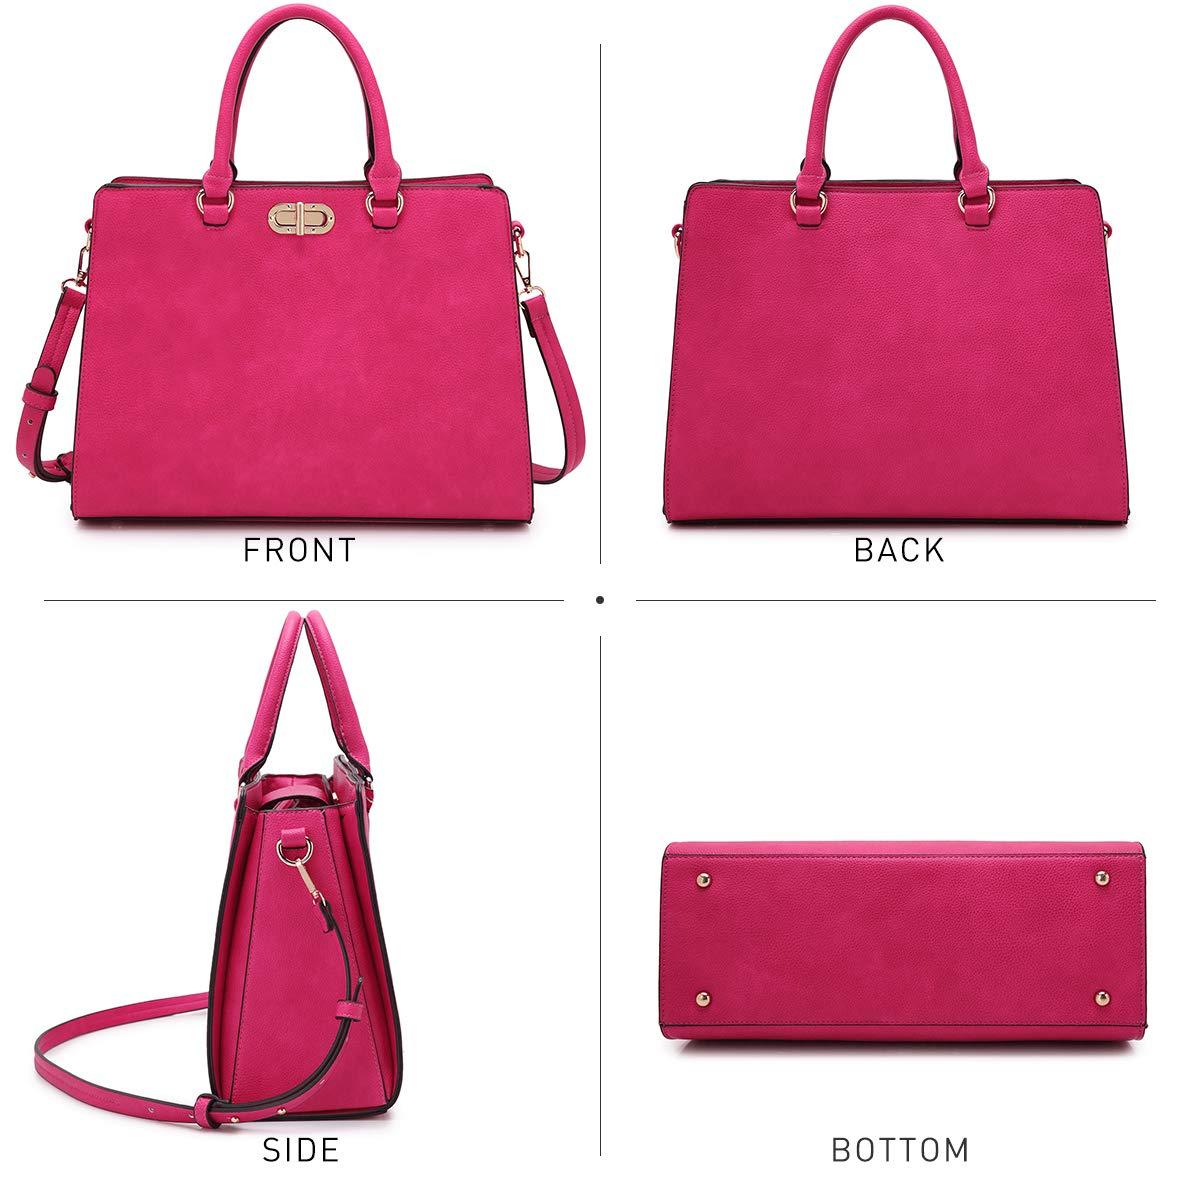 Women's Fashion Handbags Tote Purses Shoulder Bags Top Handle Satchel Purse Set 2pcs 01- Fuchsia by Dasein (Image #5)